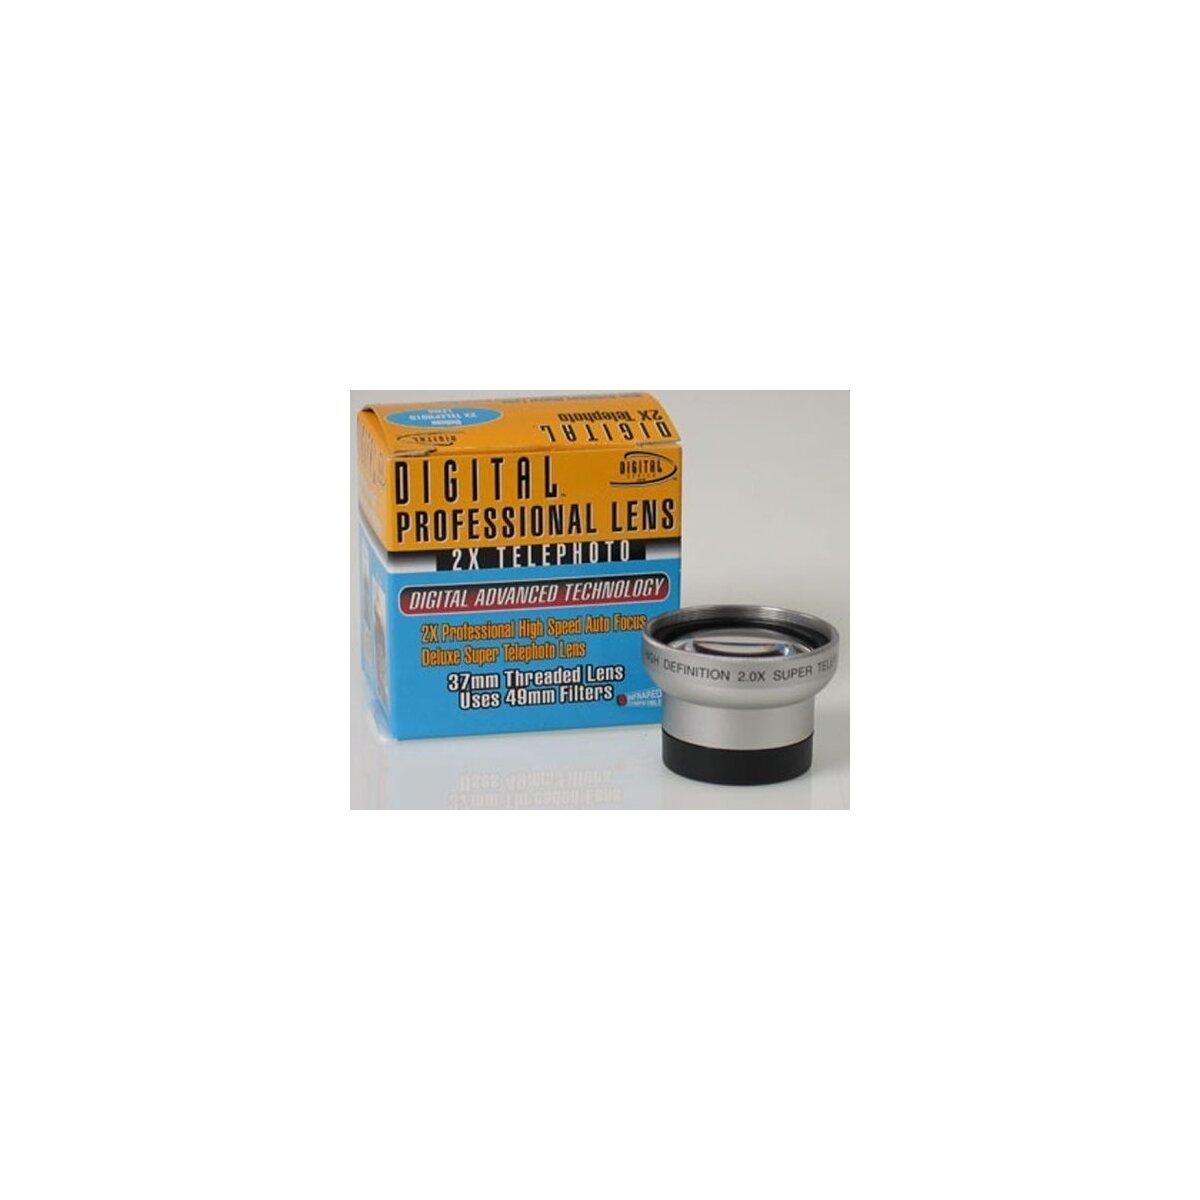 2.0x Telekonverter von Digital Optics fuer Canon MVX4i, MVX20i, MVX25i, Samsung HMX-H200, Hitachi DZ-BX35, DZ-HS300 usw